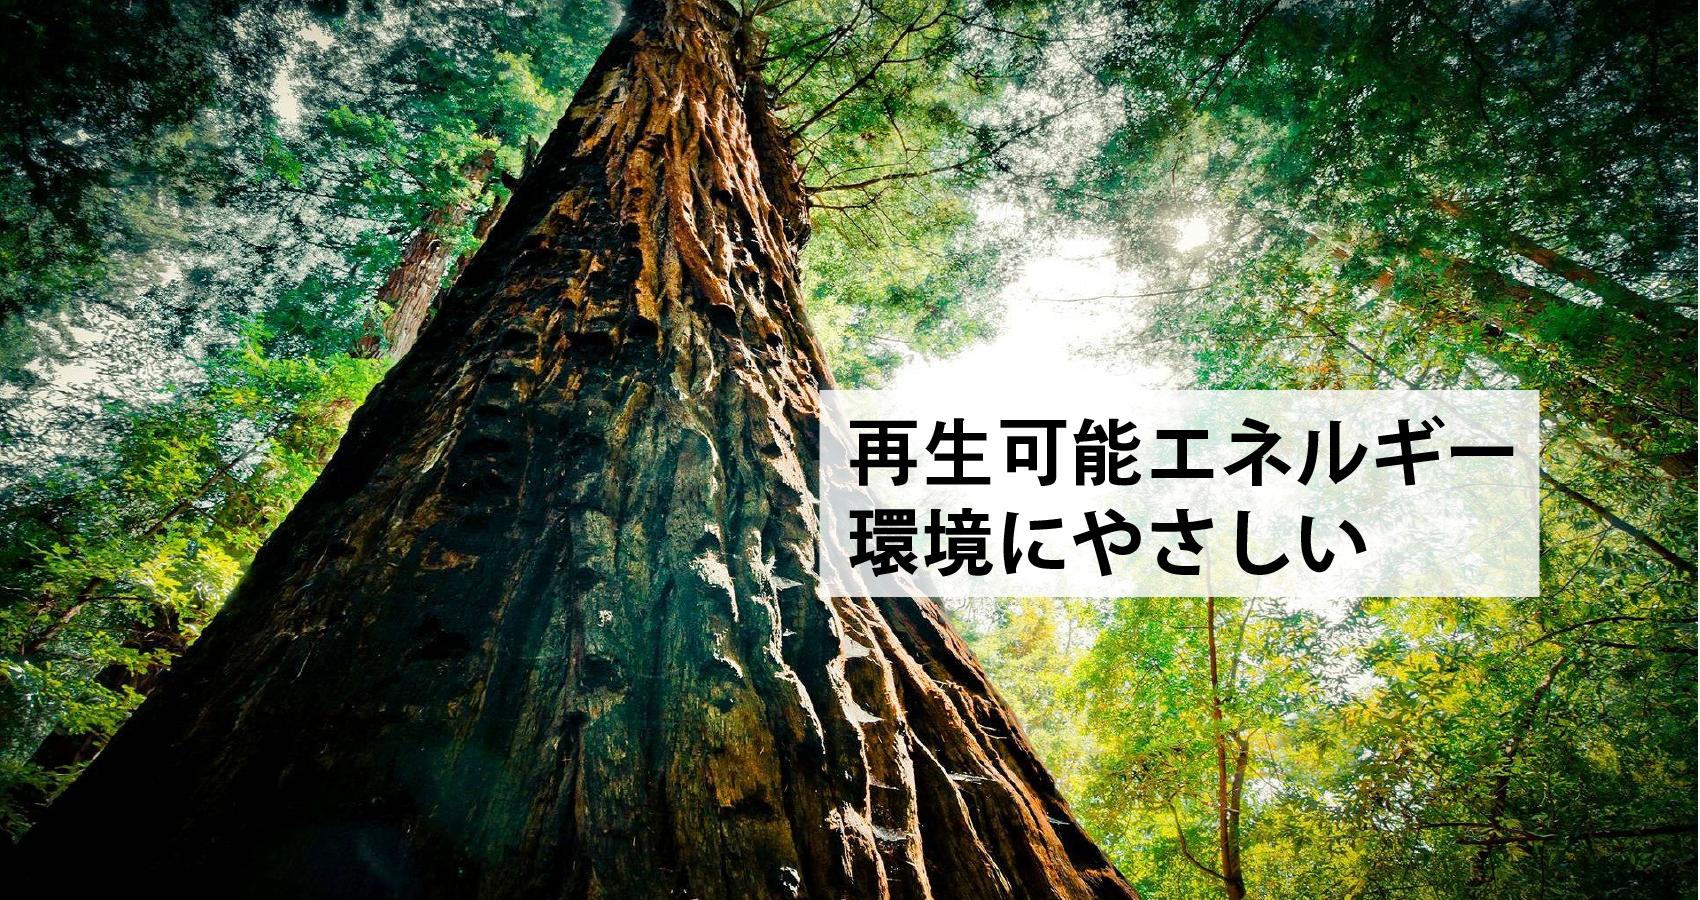 JPN.Banner__1700X900-01